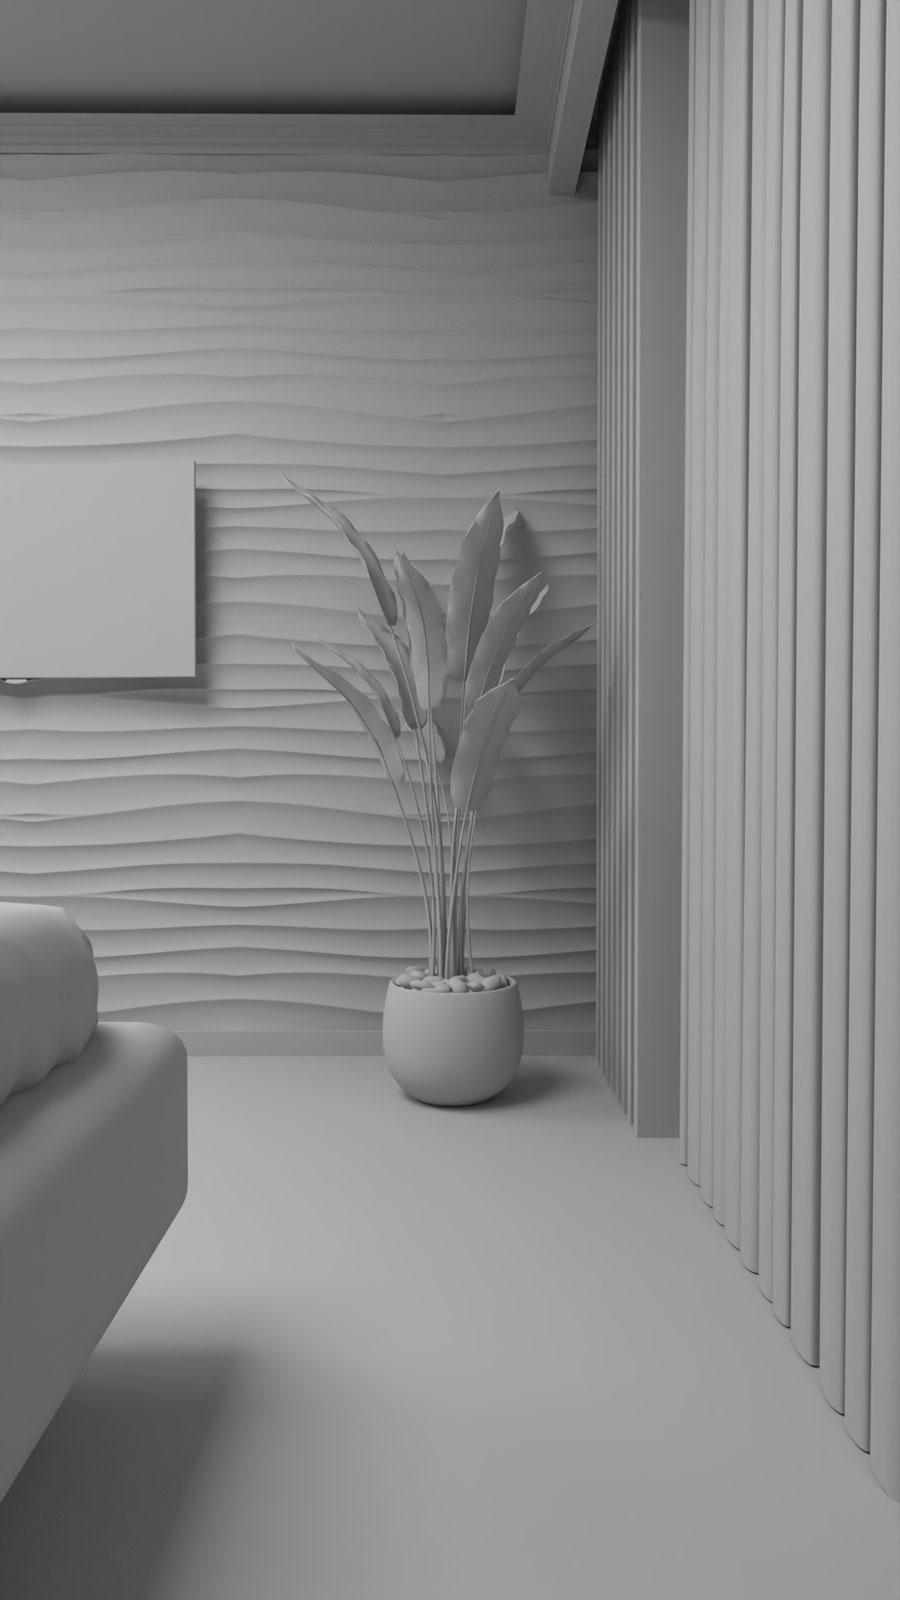 Sketchup bedroom archviz - Bitopia Falticeni 3D rendering studio